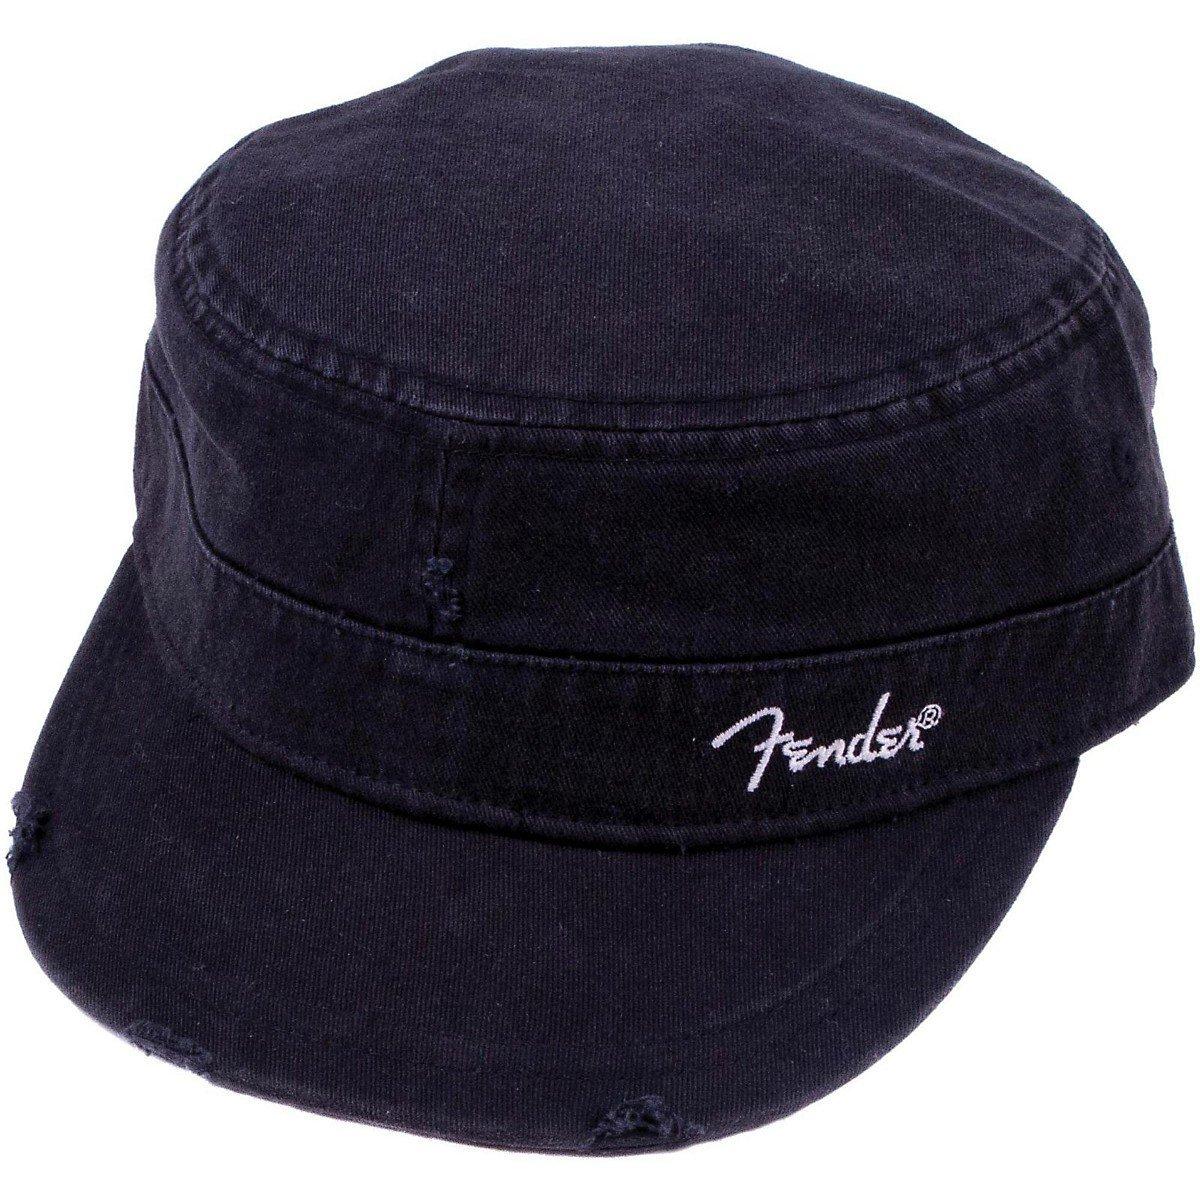 cb0fbbcfe77 Details about Genuine Fender Guitars Logo Black Military Hat Cap - S M  SMALL MEDIUM